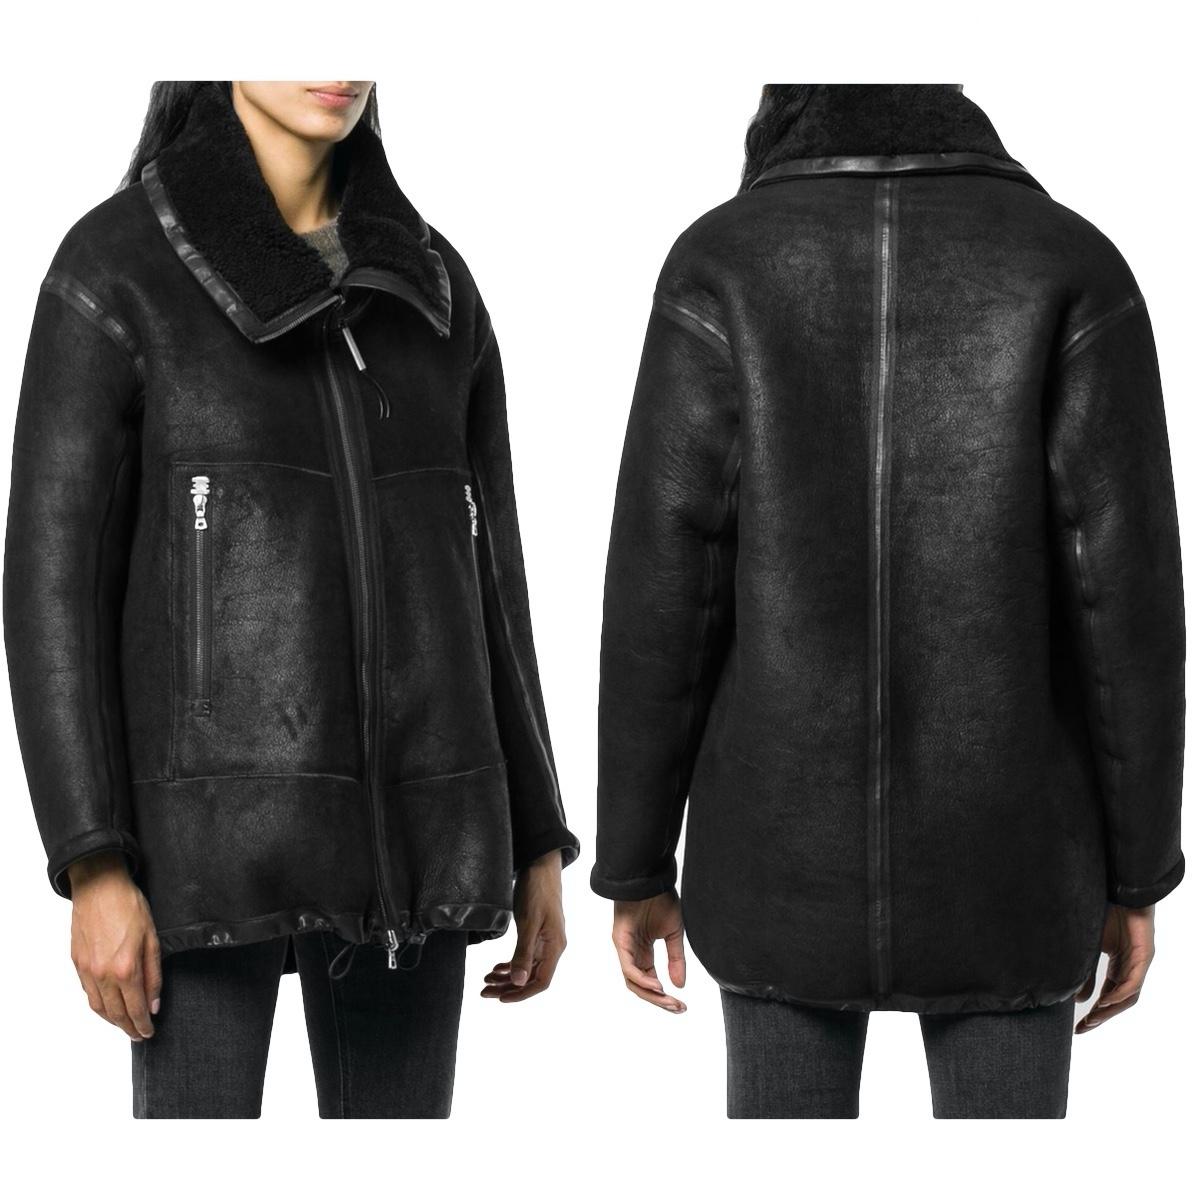 Isaac sellam reversible shearling jacket fit.jpg